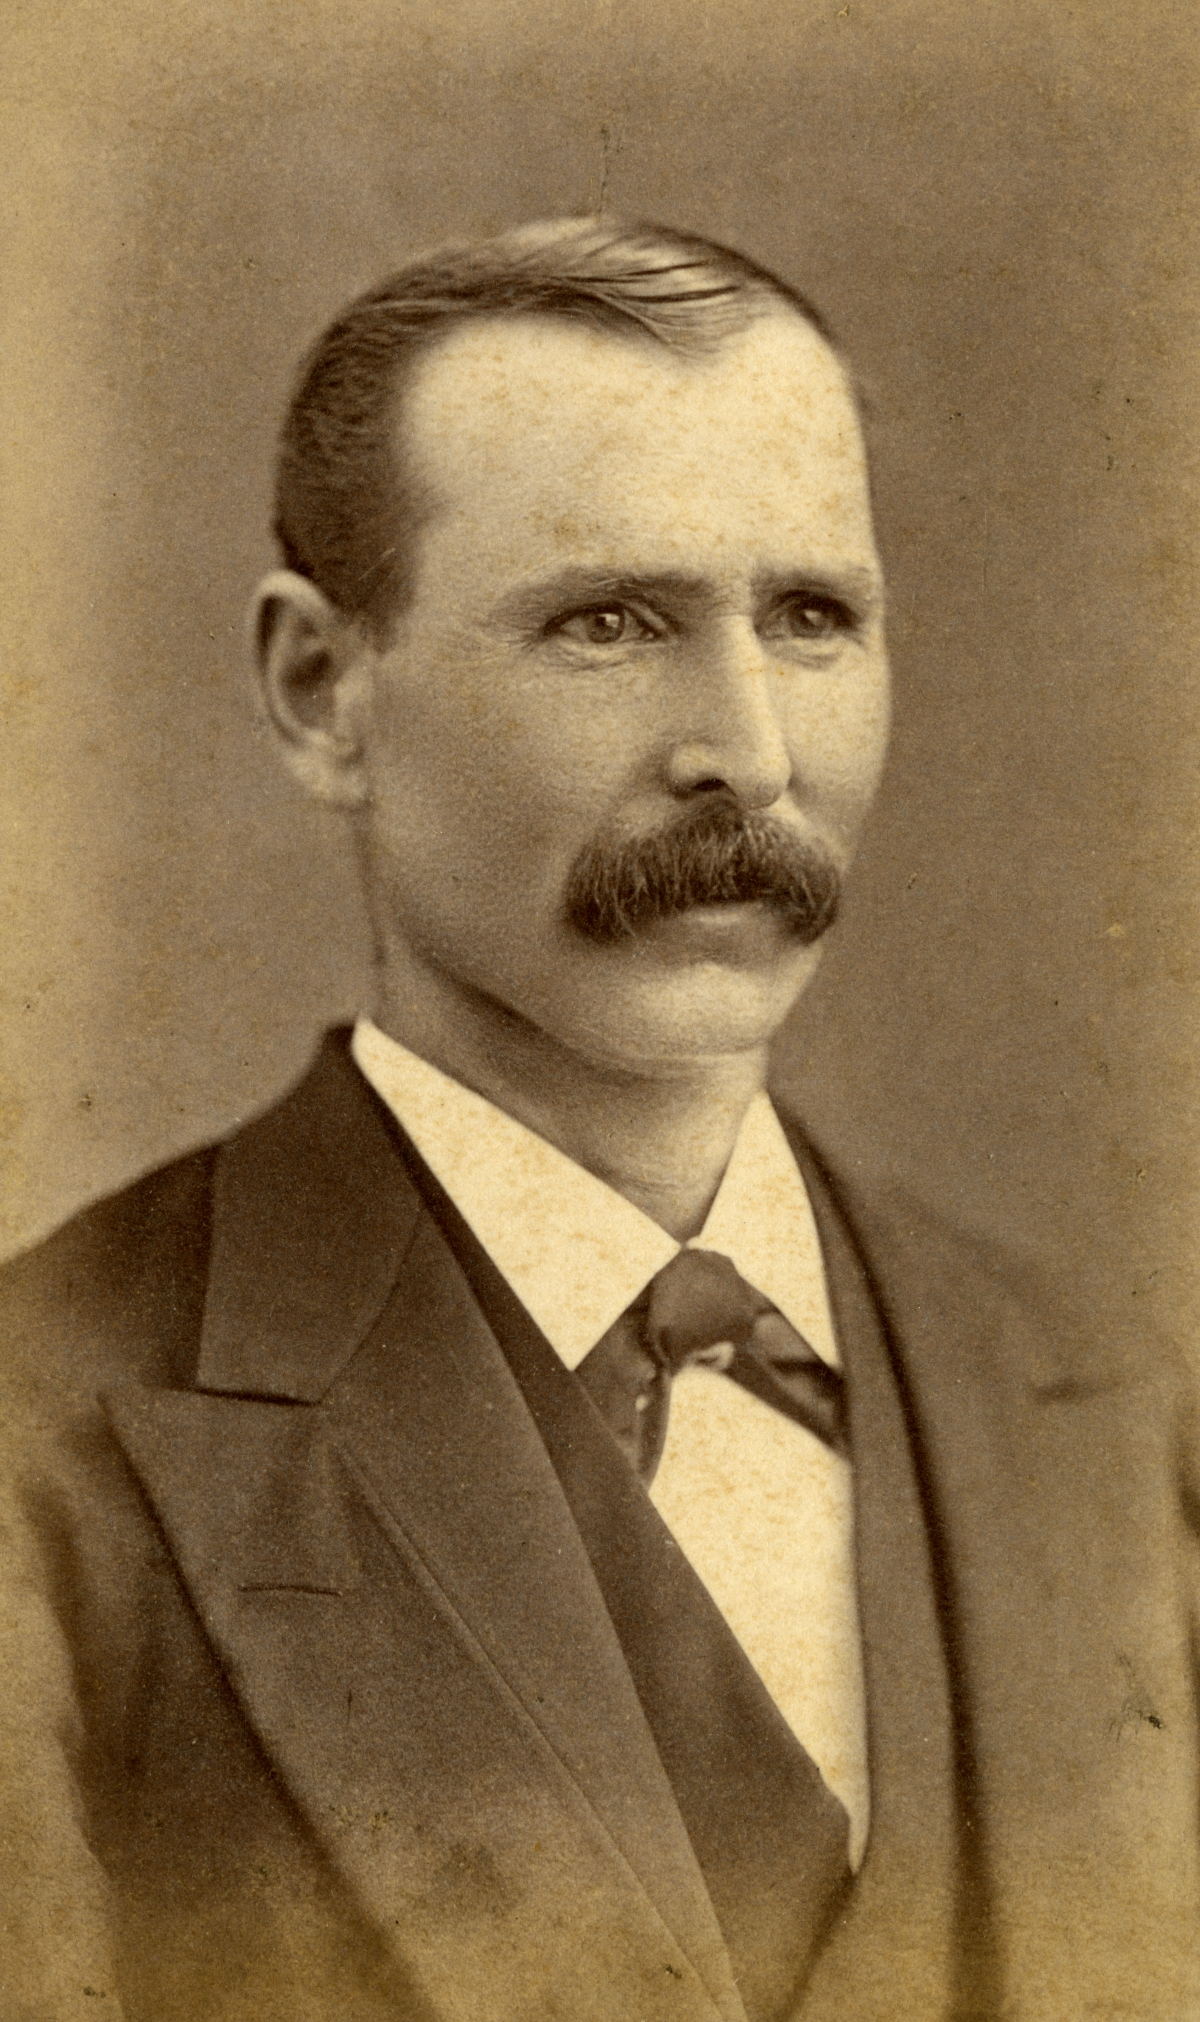 Portrait of Pomona Park pioneer George Otterson.